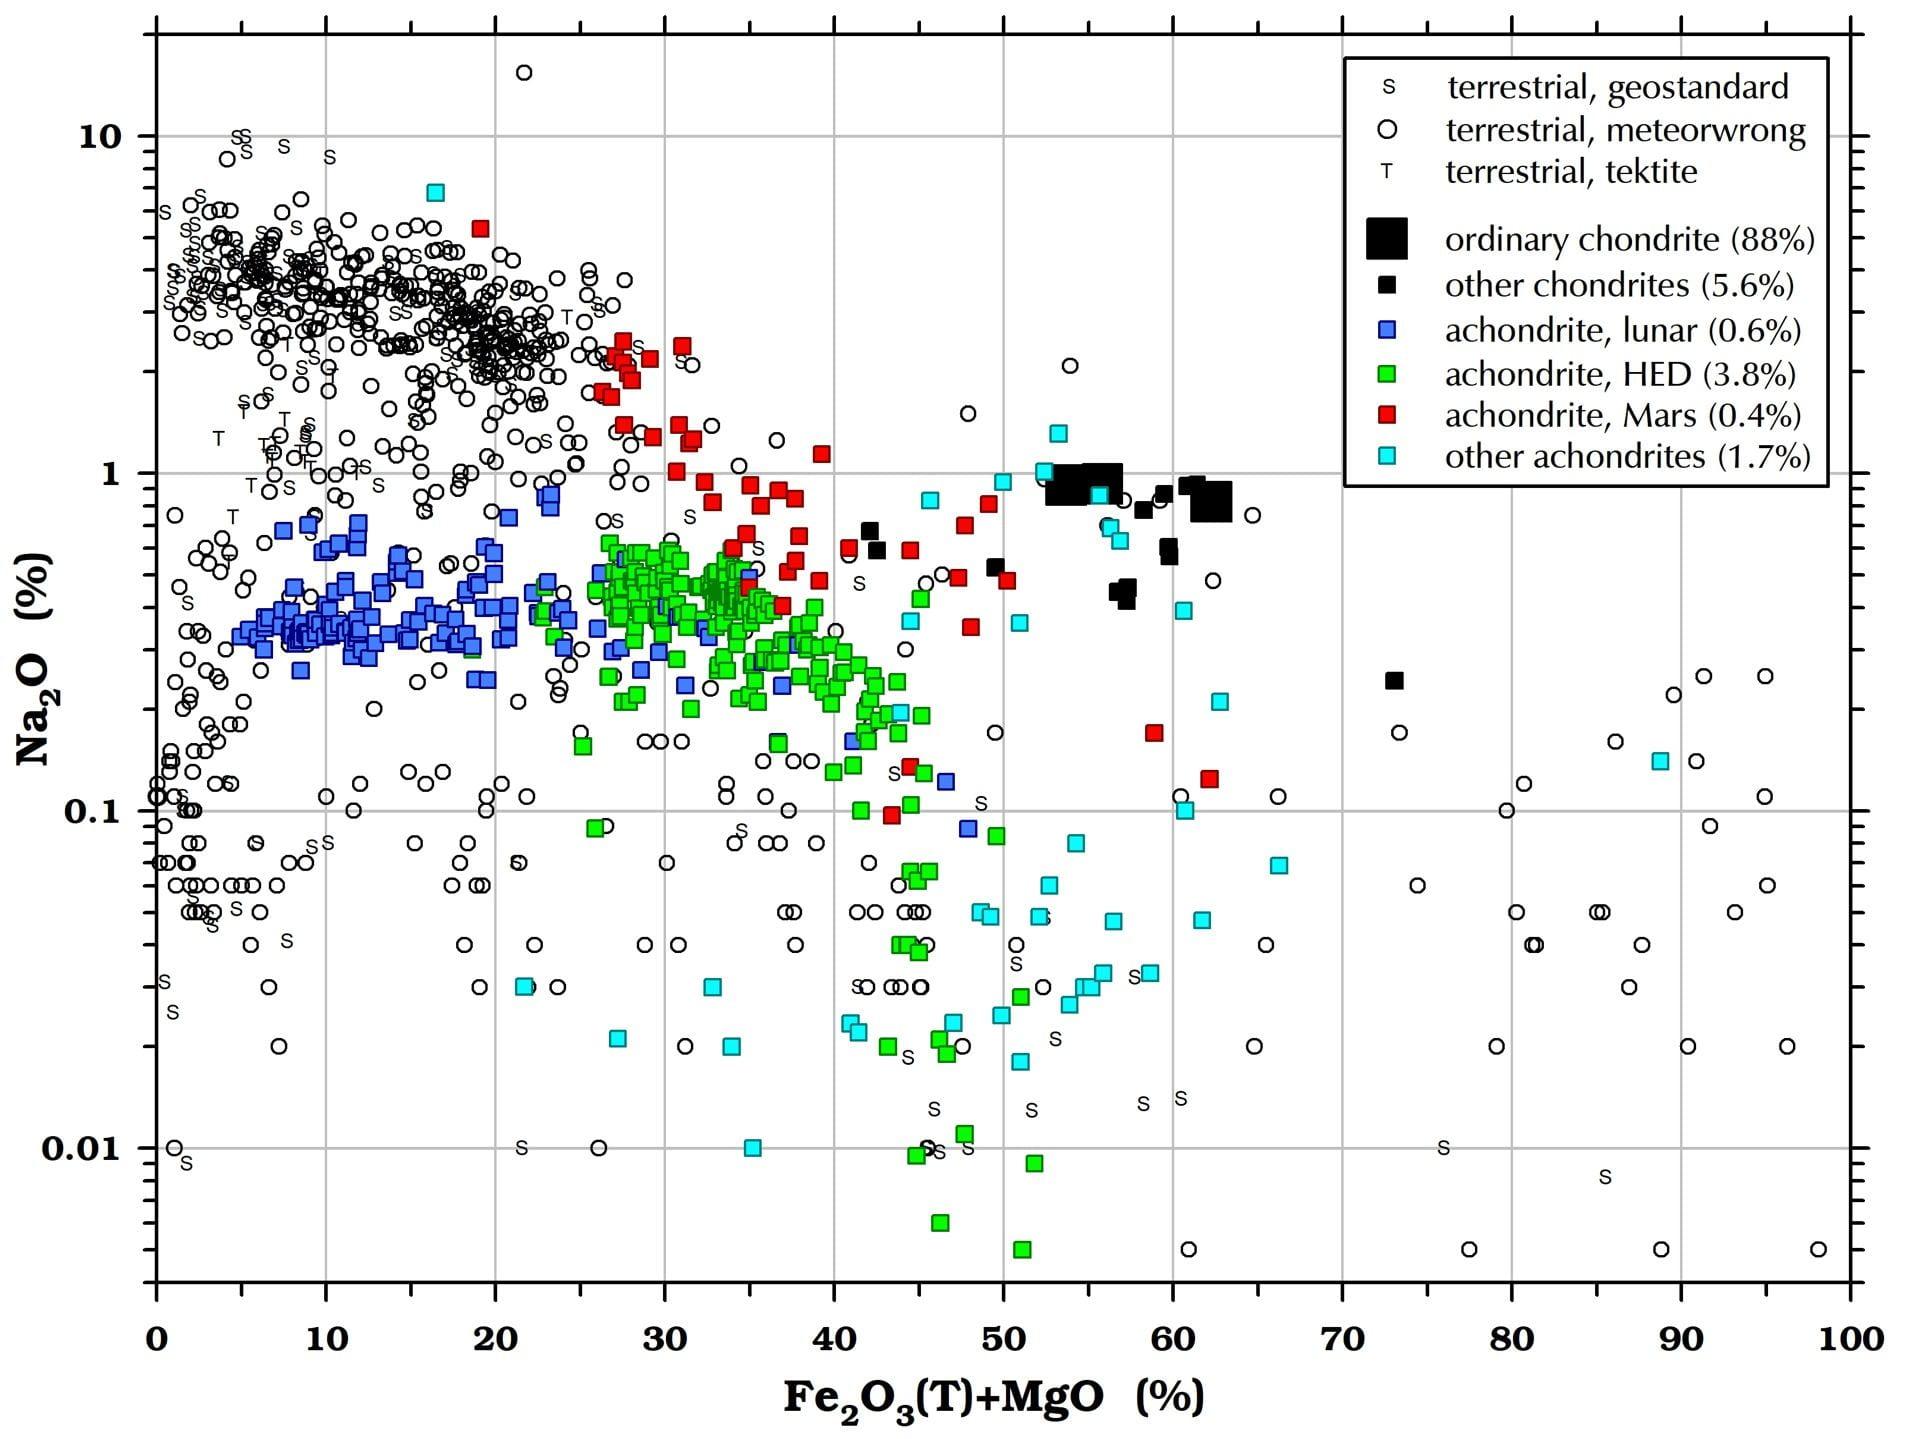 Sodium (Na2O) in meteorites and terrestrial rocks